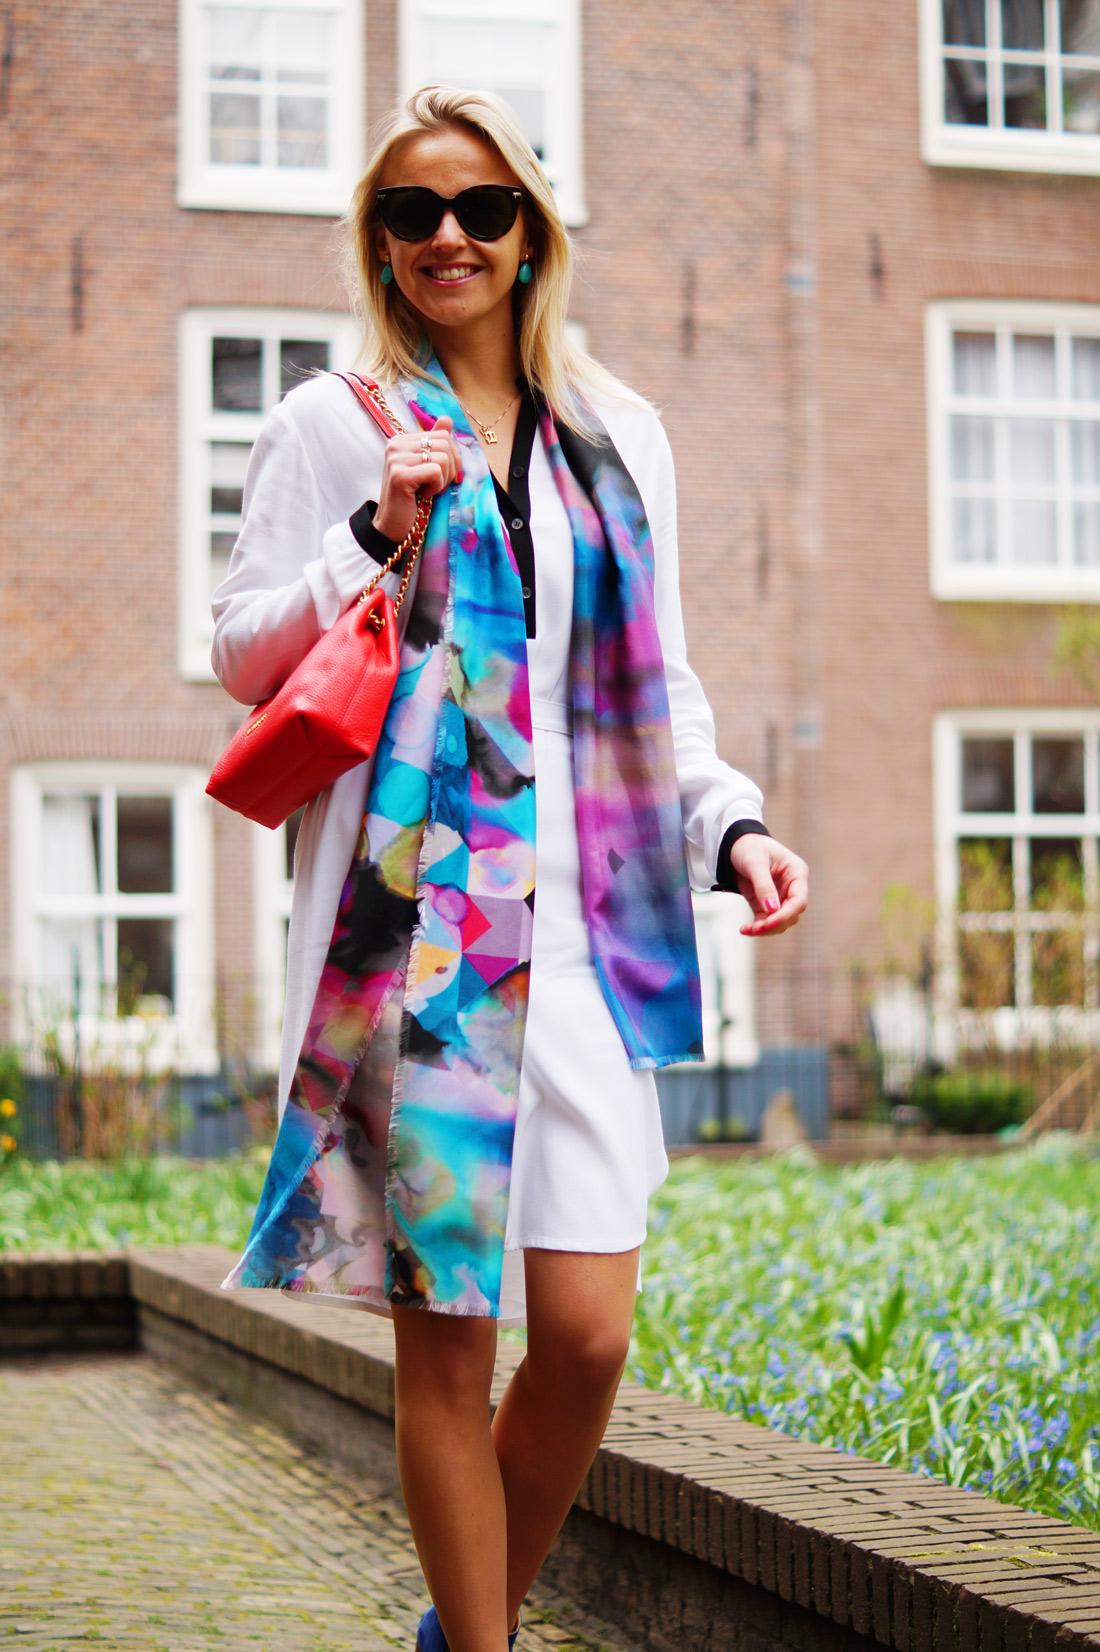 Bag-at-you---Styleblogger---Michael-Kors-Bag---Look-Spring